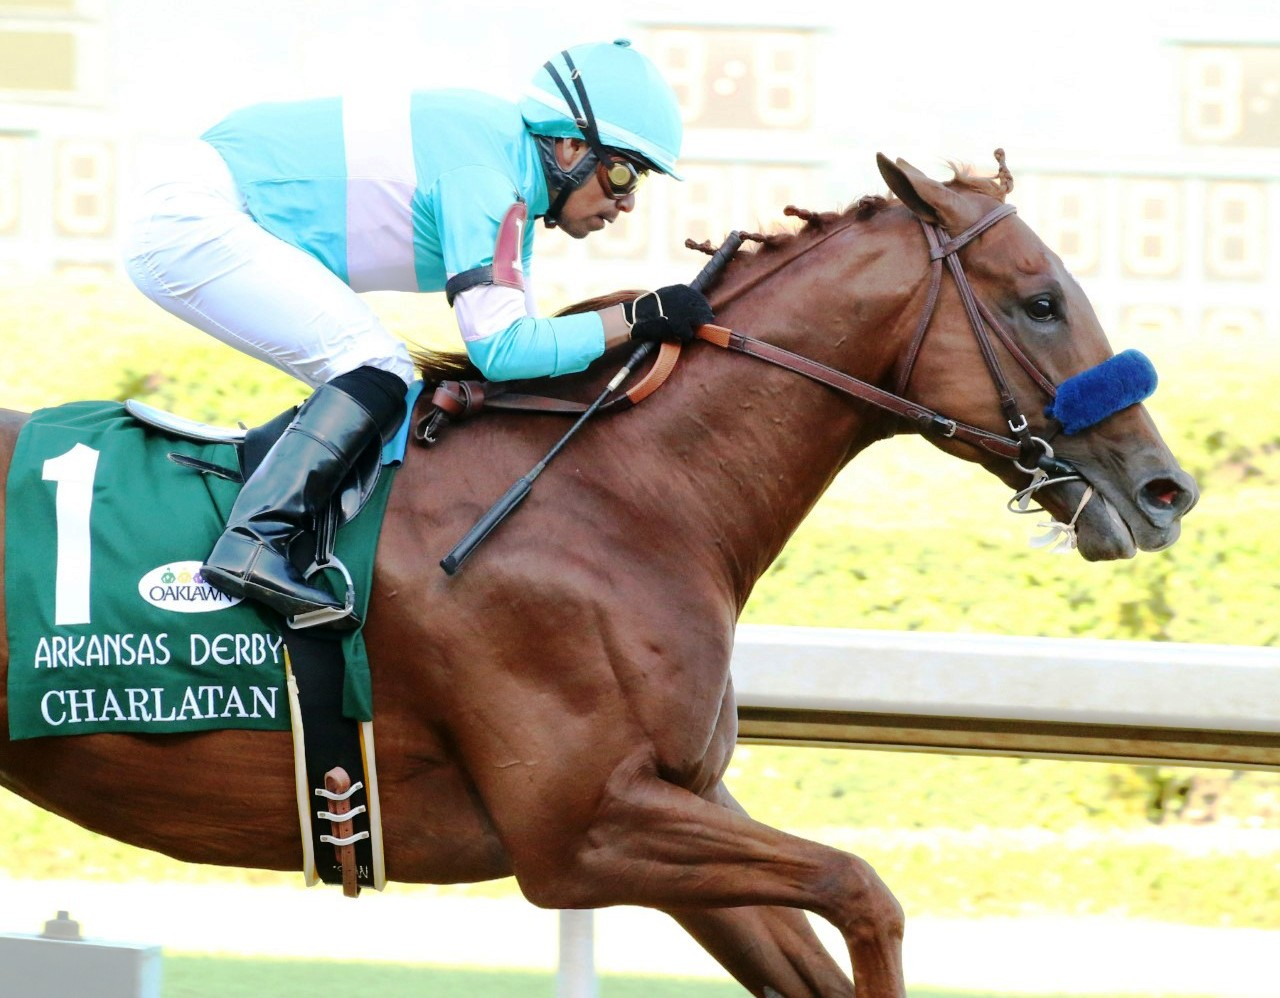 Racing post betting calculator vegas online sports betting regulation pool